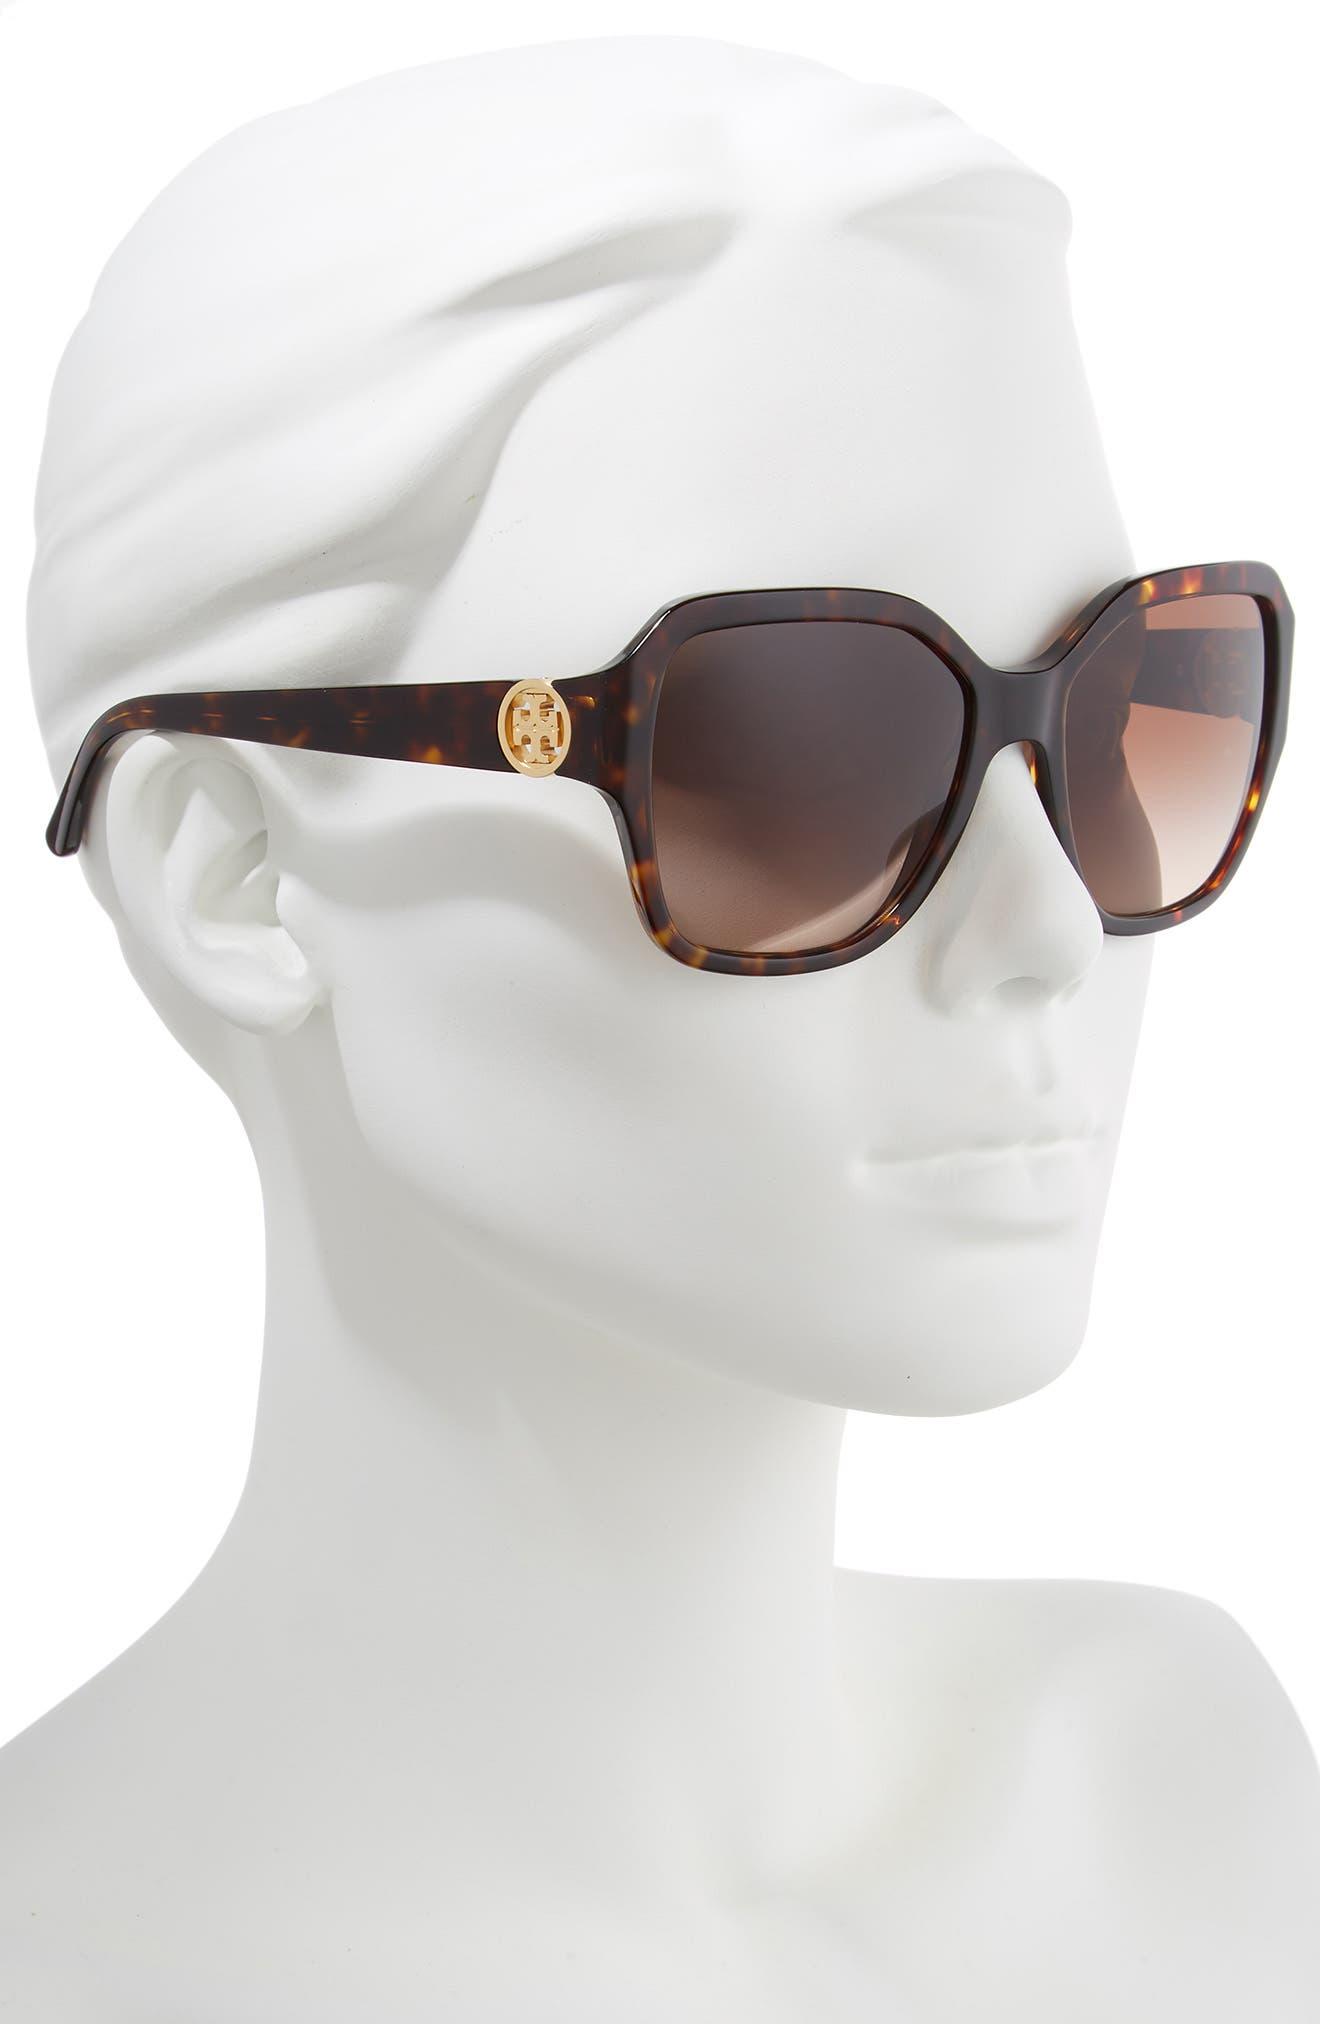 TORY BURCH, Reva 56mm Square Sunglasses, Alternate thumbnail 2, color, DARK TORTOISE GRADIENT